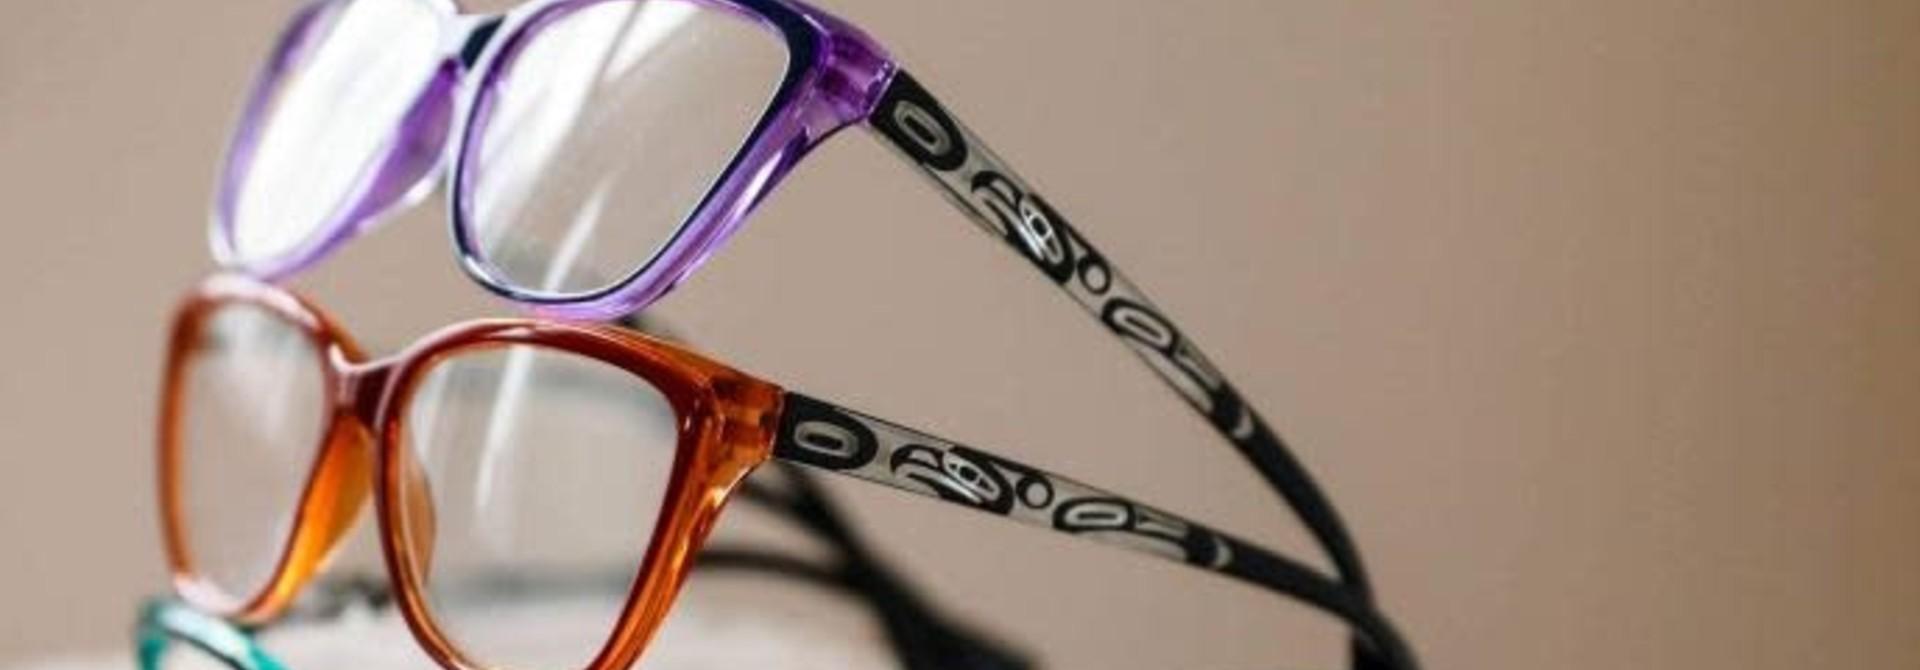 Jose Thunderbird Reading Glasses - Corrine Hunt